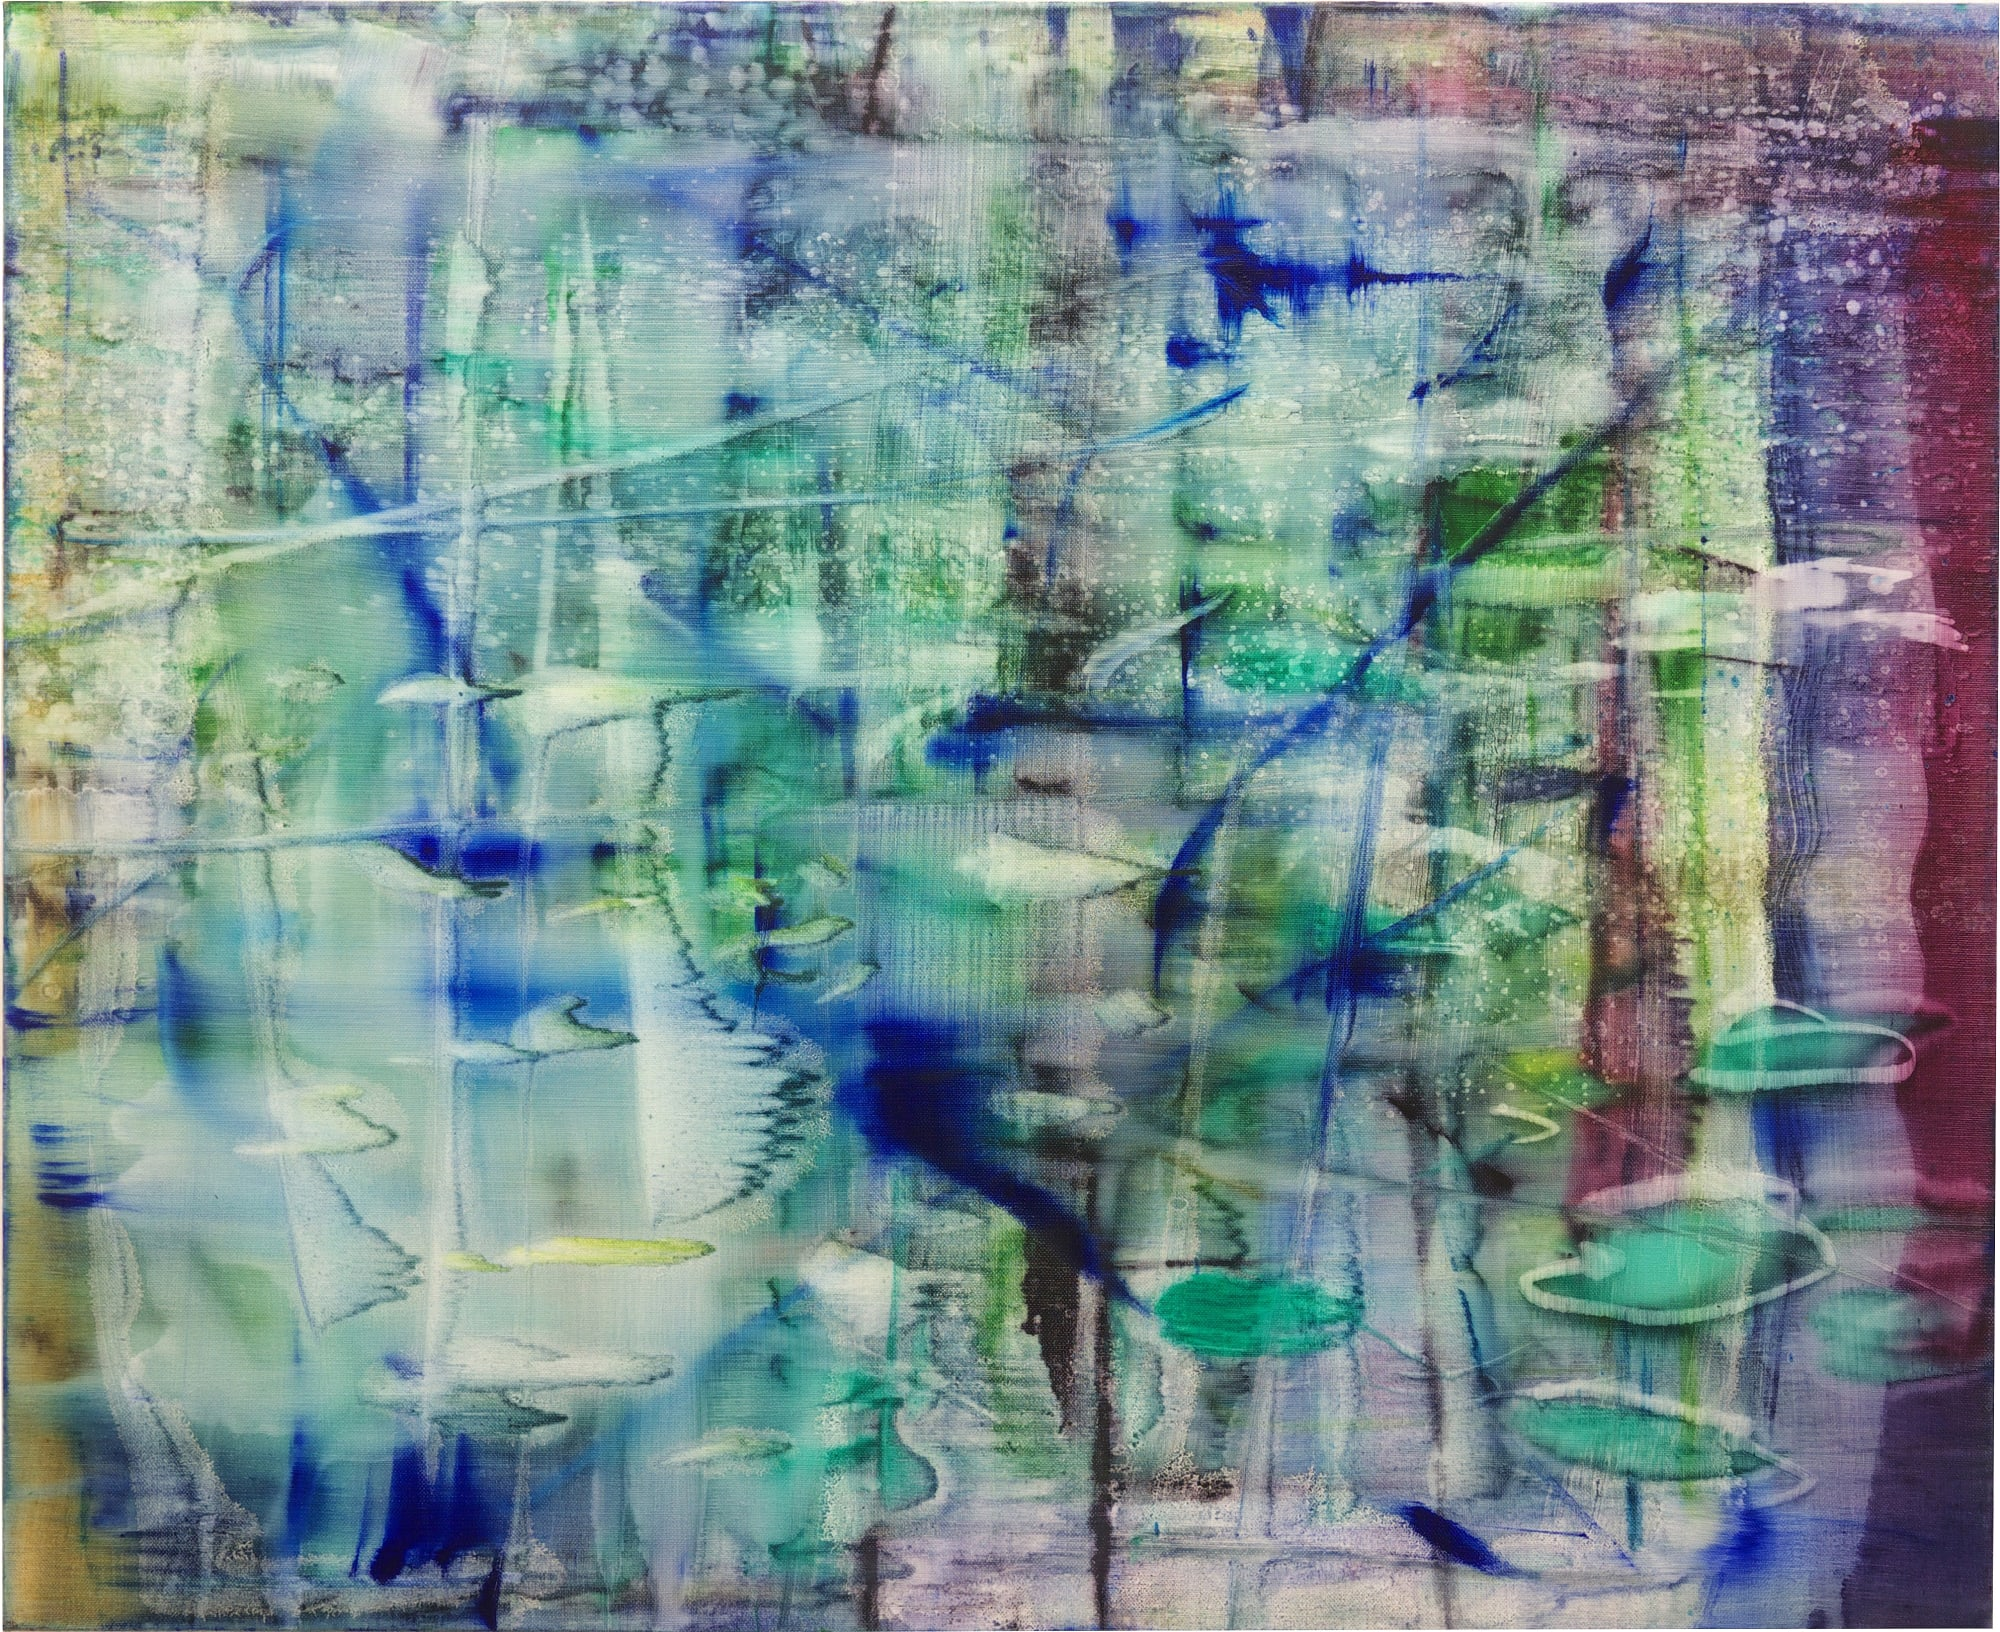 Matthias Meyer: Ponds and Blossoms